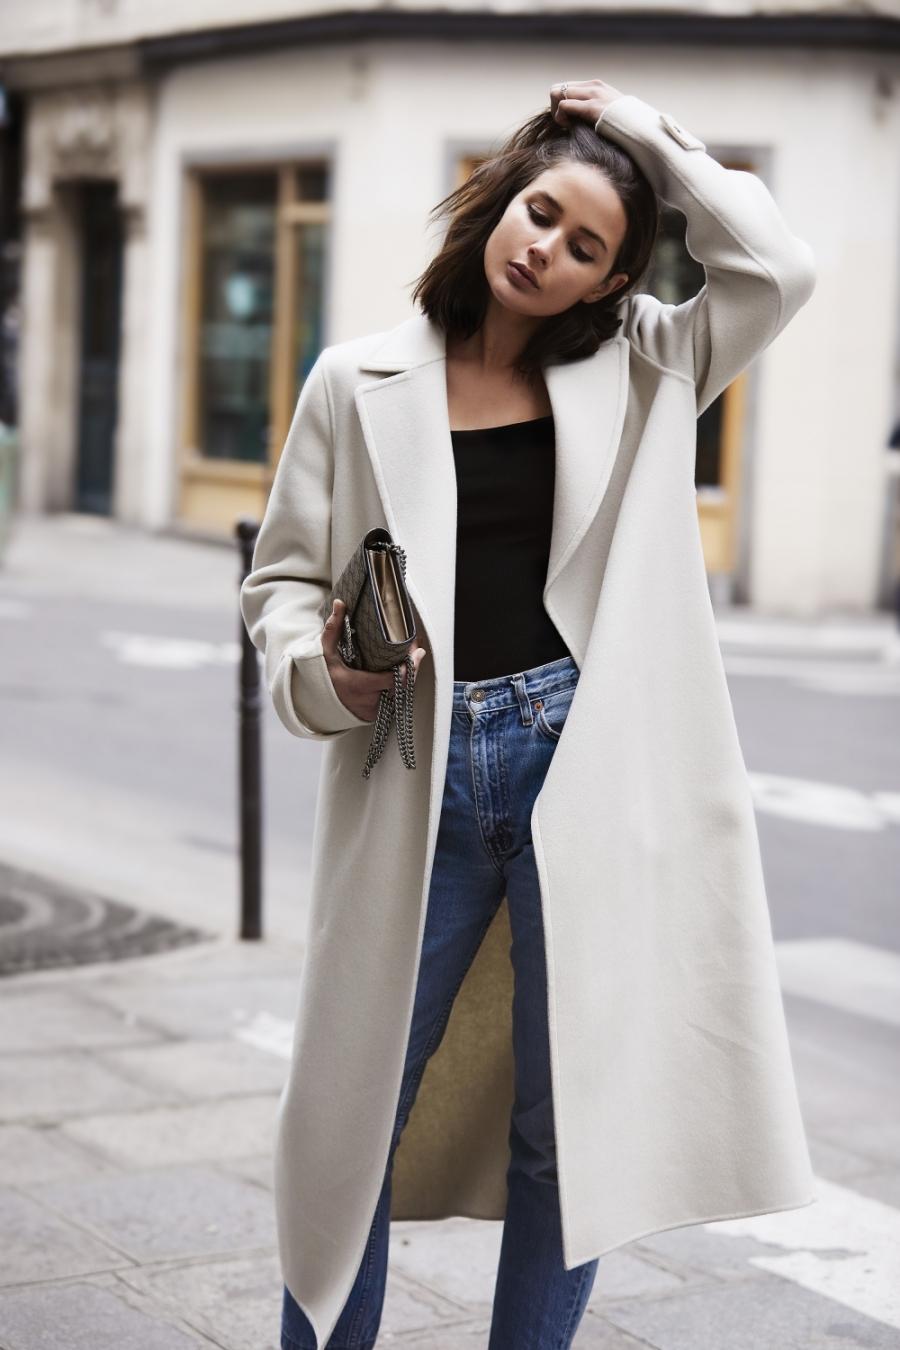 harperandHarley_Joseph-Fashion_cream-coat_Paris_3-nfhnbznkjjvcuxhchrcbi1j1zl3yiirg2gycnlte4c